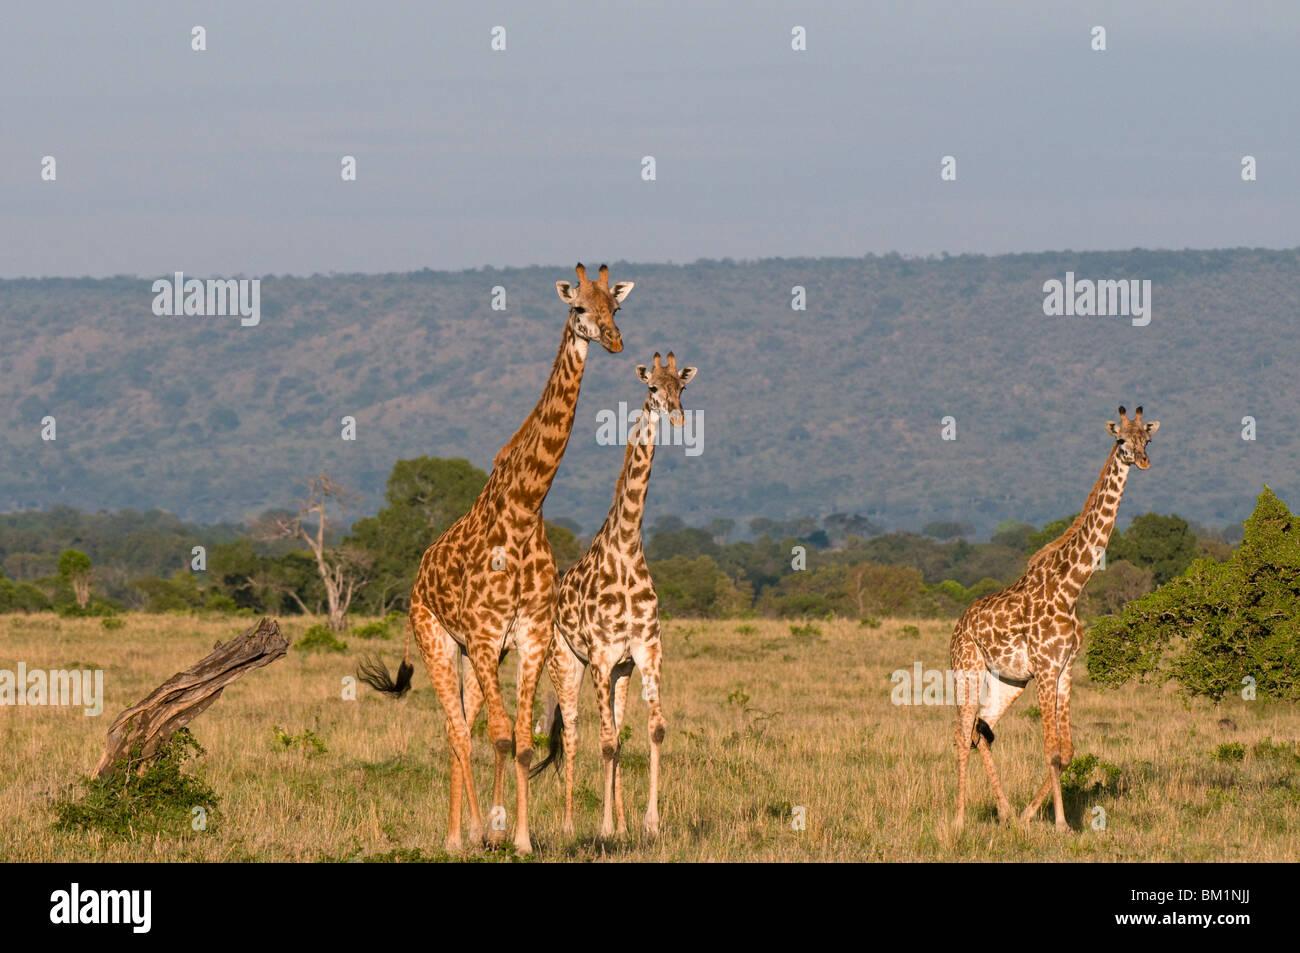 Masai jirafa (Giraffa camelopardalis), Reserva Nacional de Masai Mara, Kenia, África oriental, África Imagen De Stock